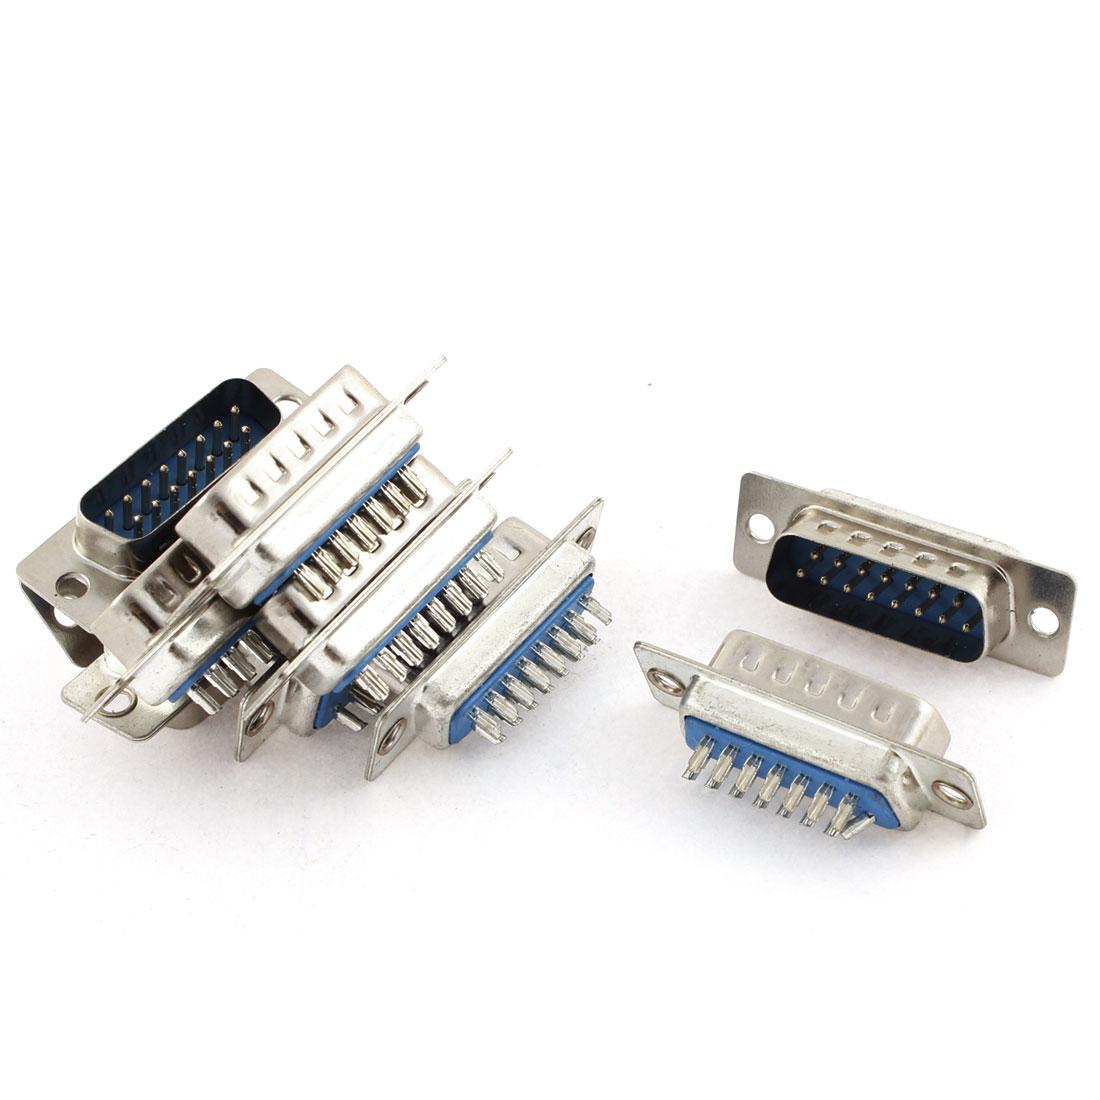 DB15 8+7 15-Pin 2 Row Male D-Sub Computer VGA Cable Connector Adapter 10 Pcs